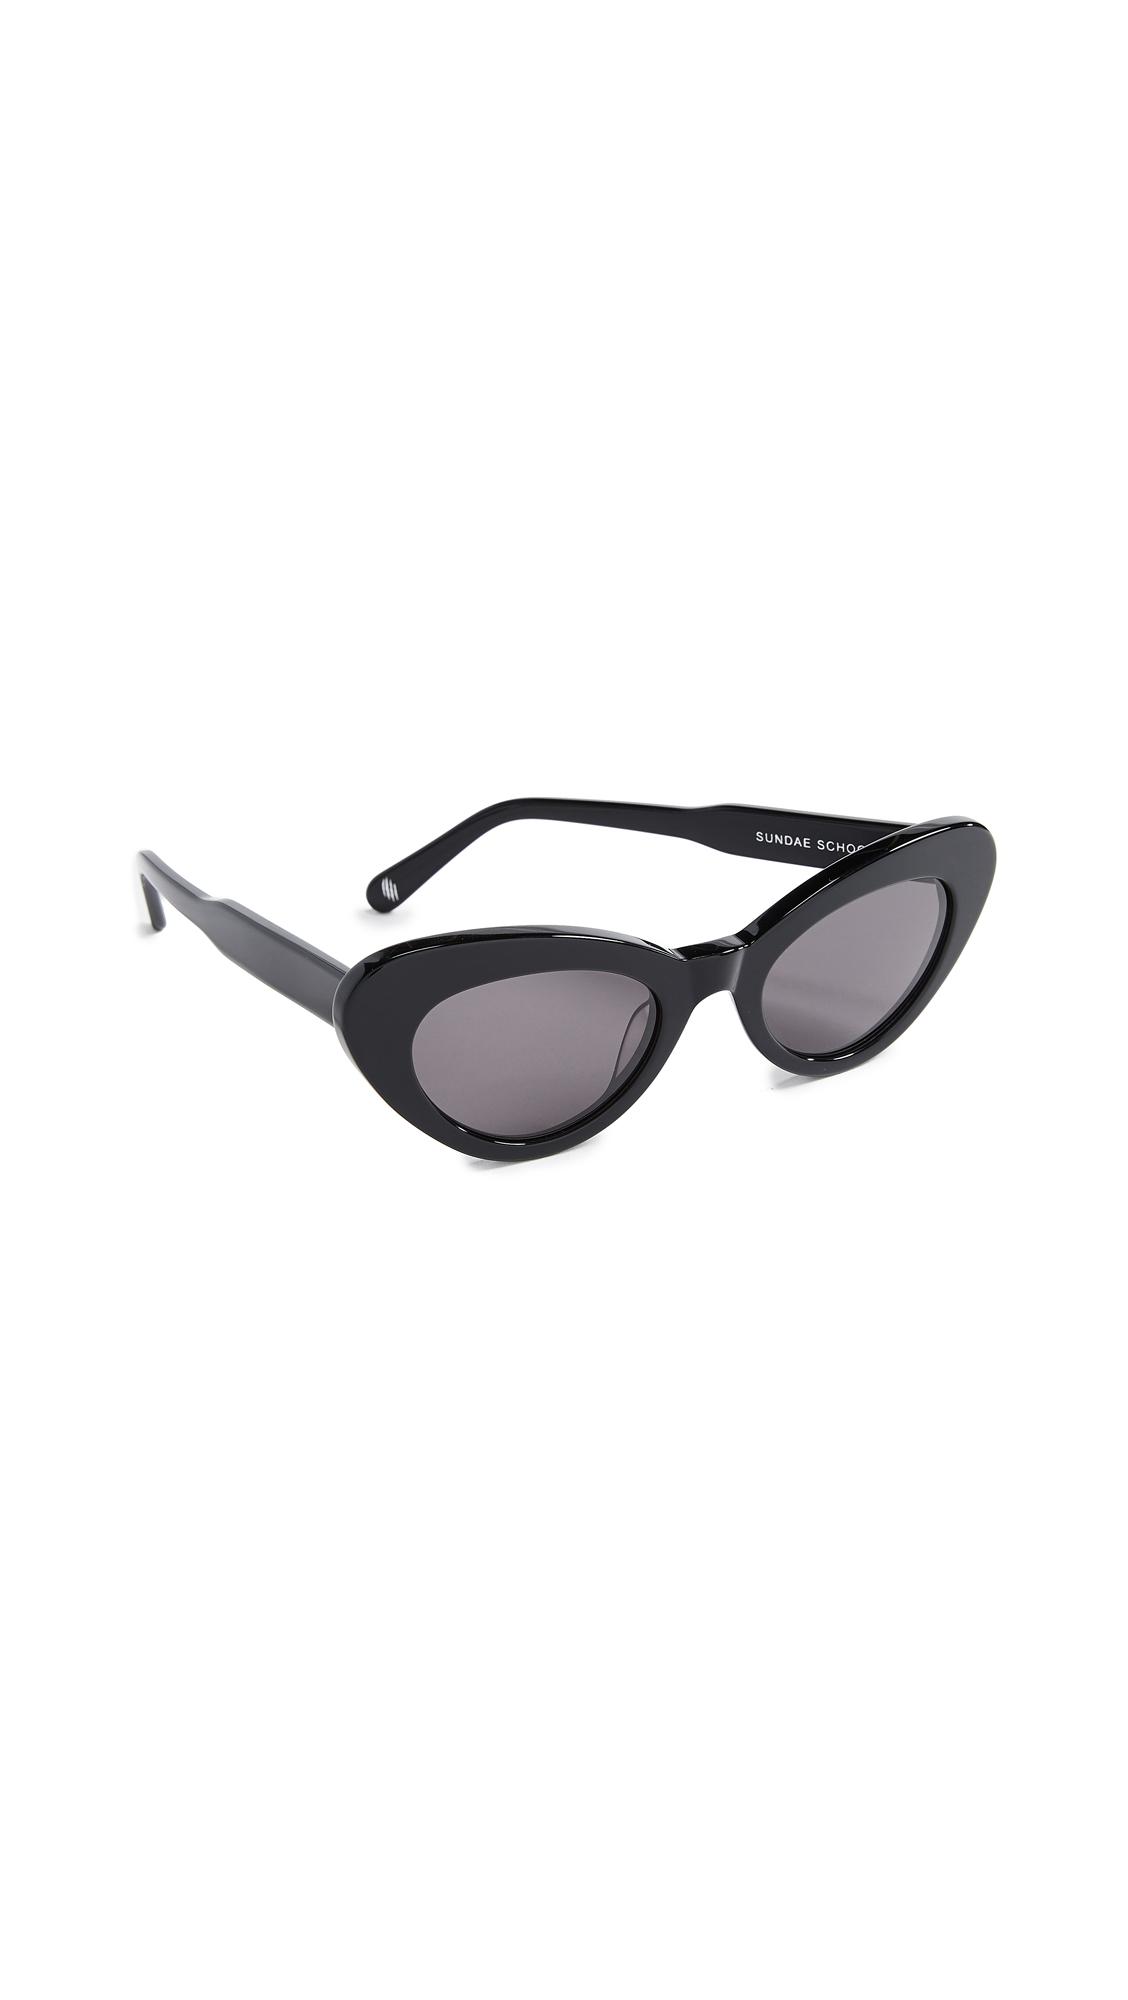 CHIMI Sundae School Round Sunglasses in Black